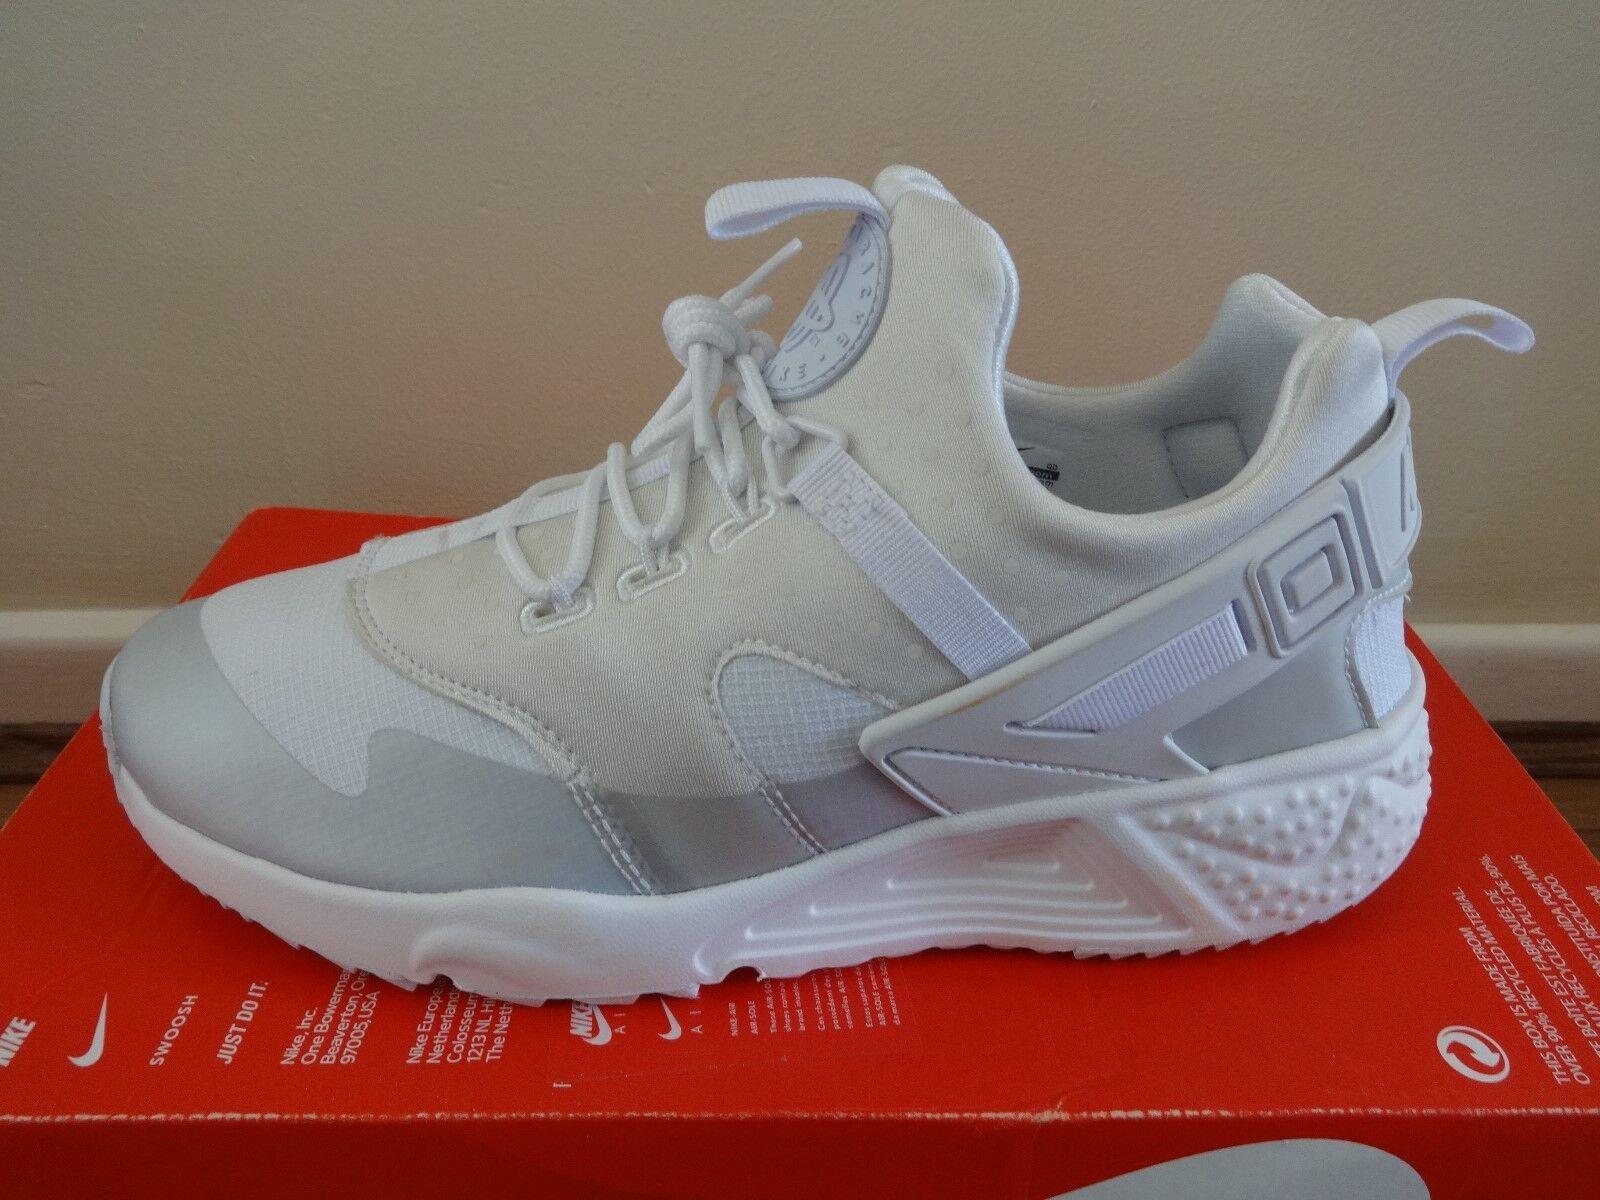 Nike Air Huarache utility trainers Turnschuhe 806807 100 us uk 9 eu 44 us 100 10 NEW 512722